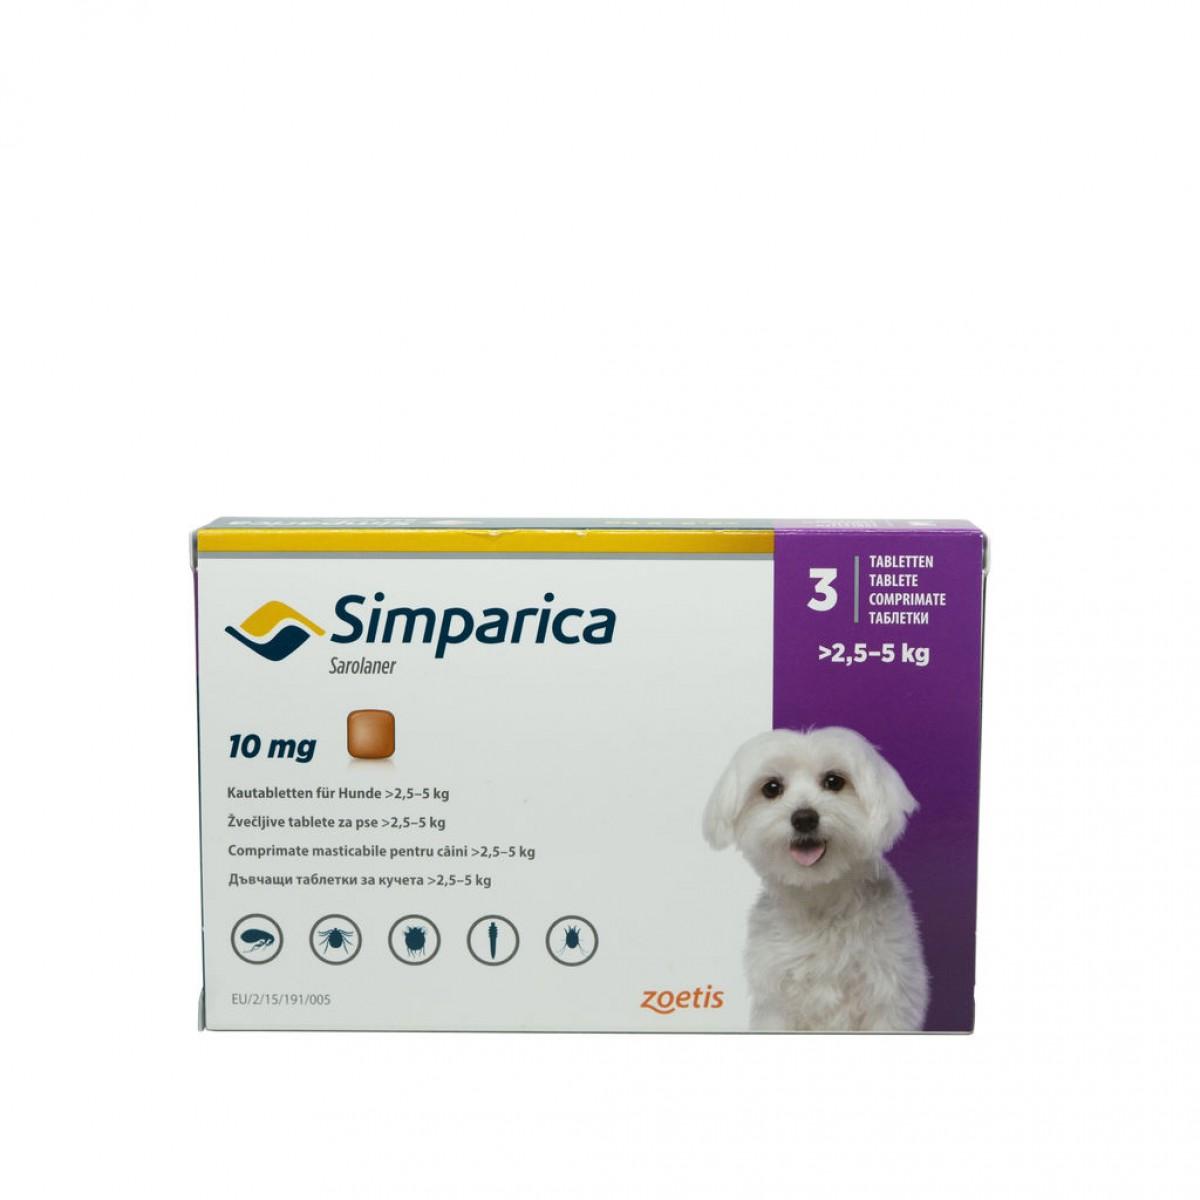 Comprimat masticabil antiparazitar Simparica 10 mg pentru câini de 2.5 - 5kg